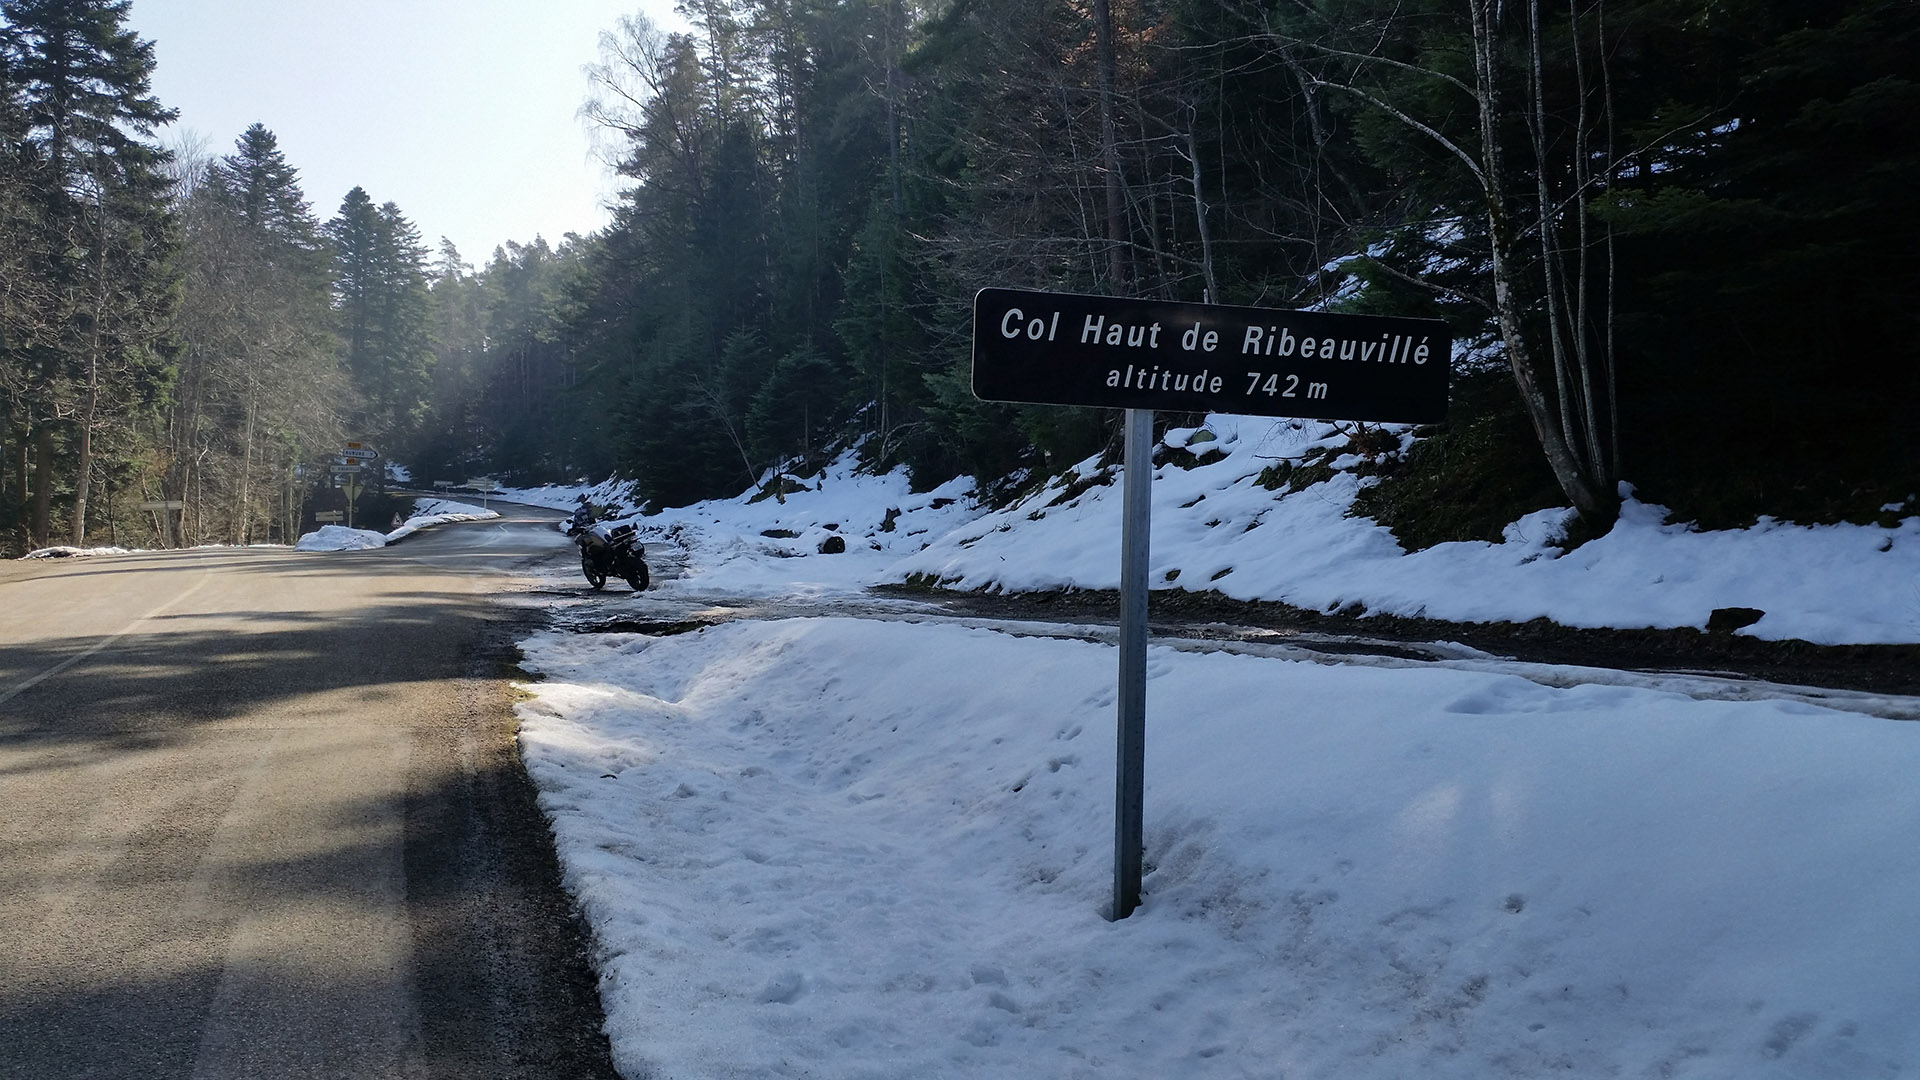 0742 - F - Col Haut de Ribeauvillé